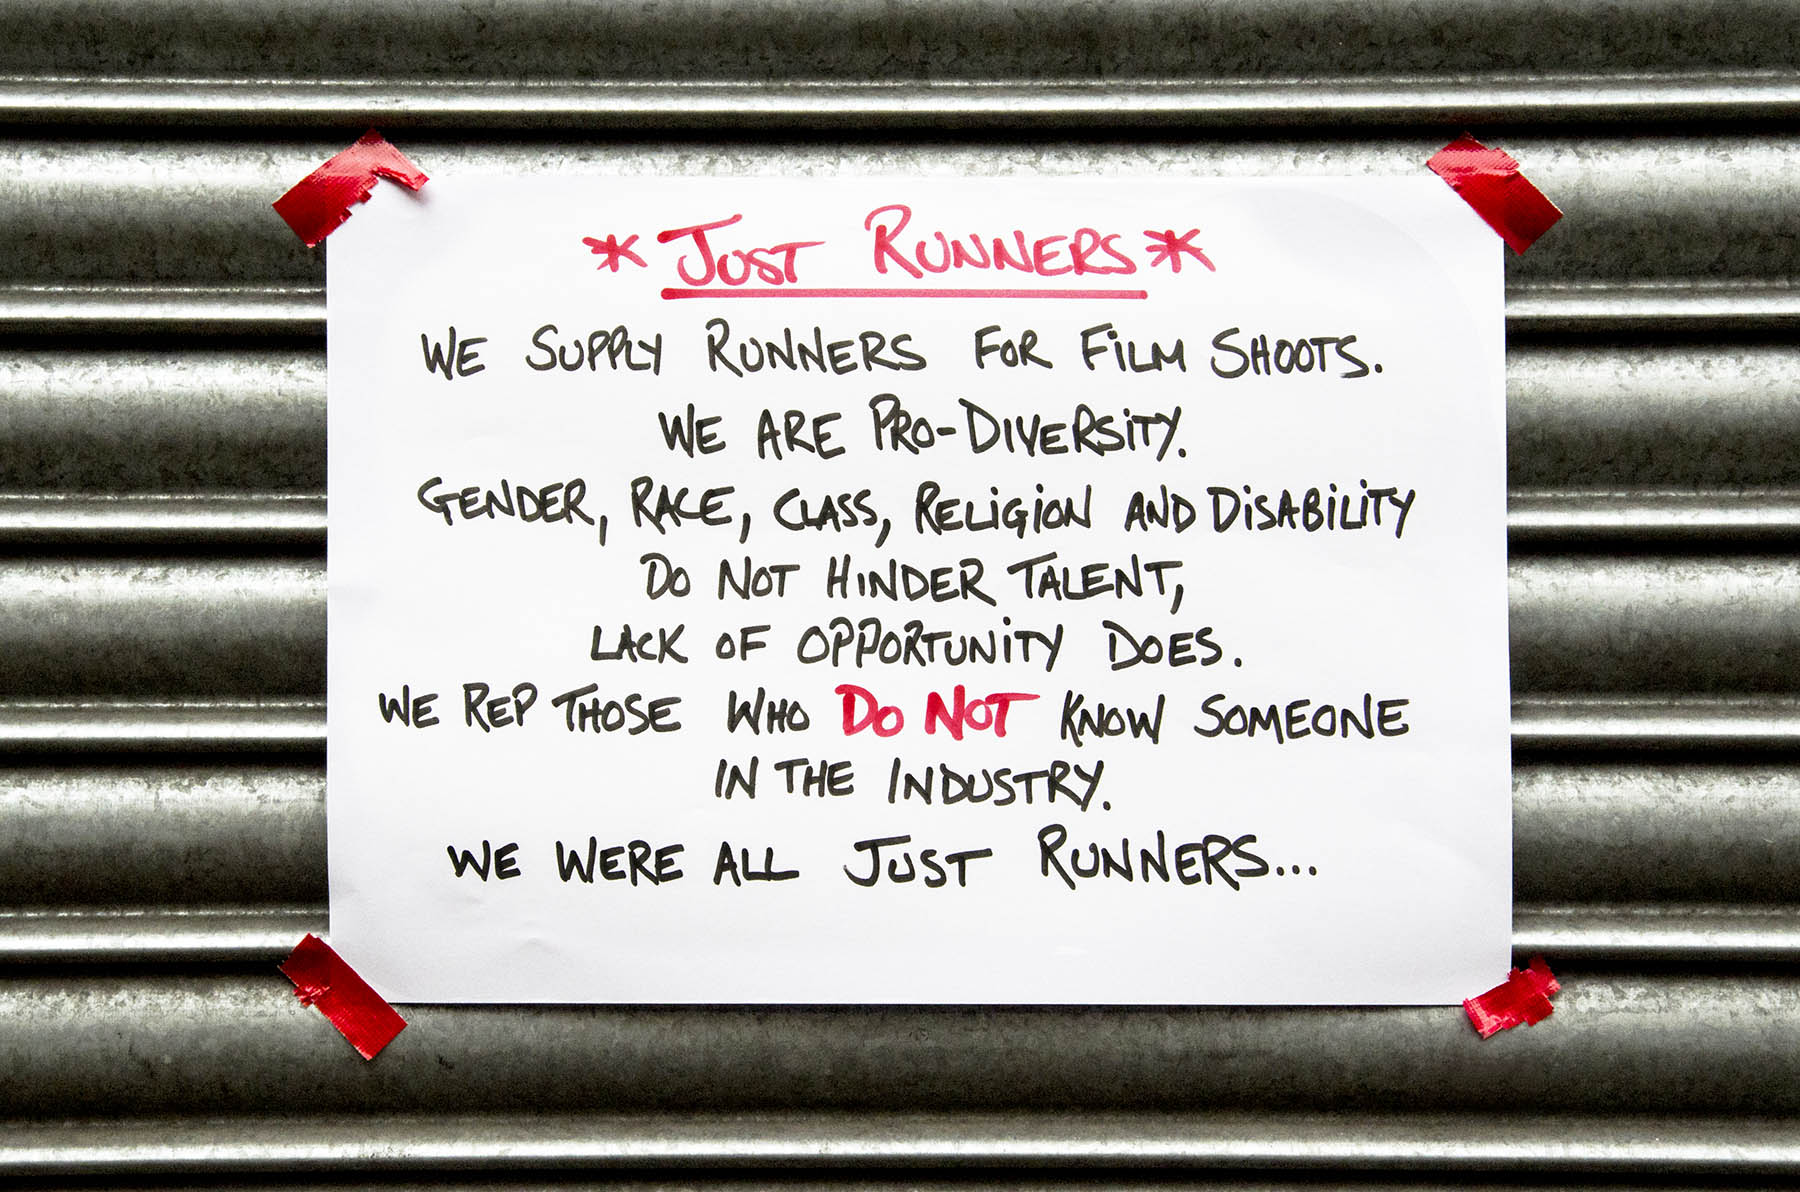 just-runners-mission-statement.jpg